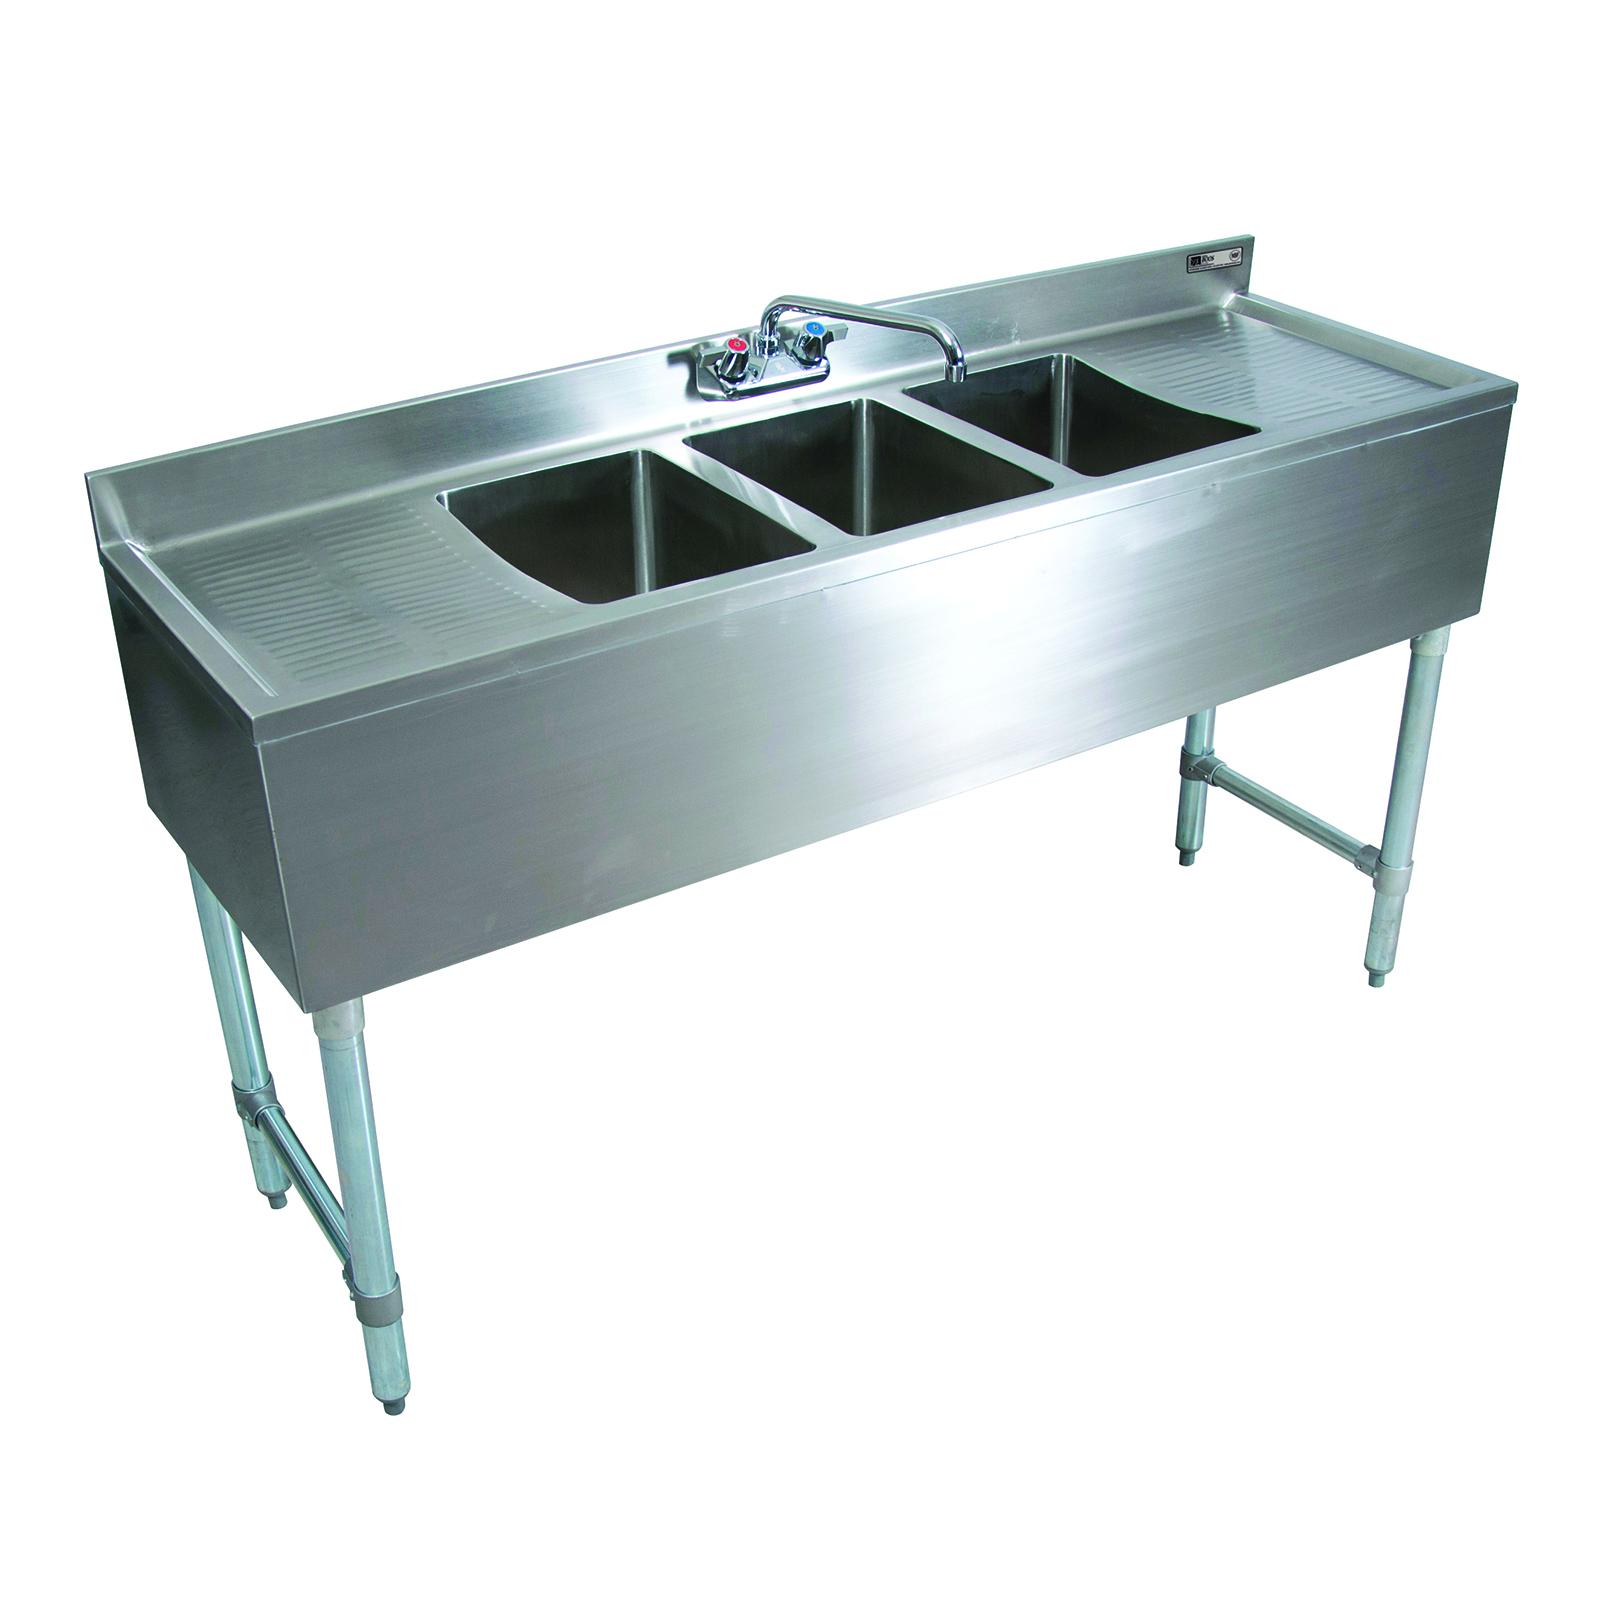 John Boos EUB2S48-1RD underbar sink units